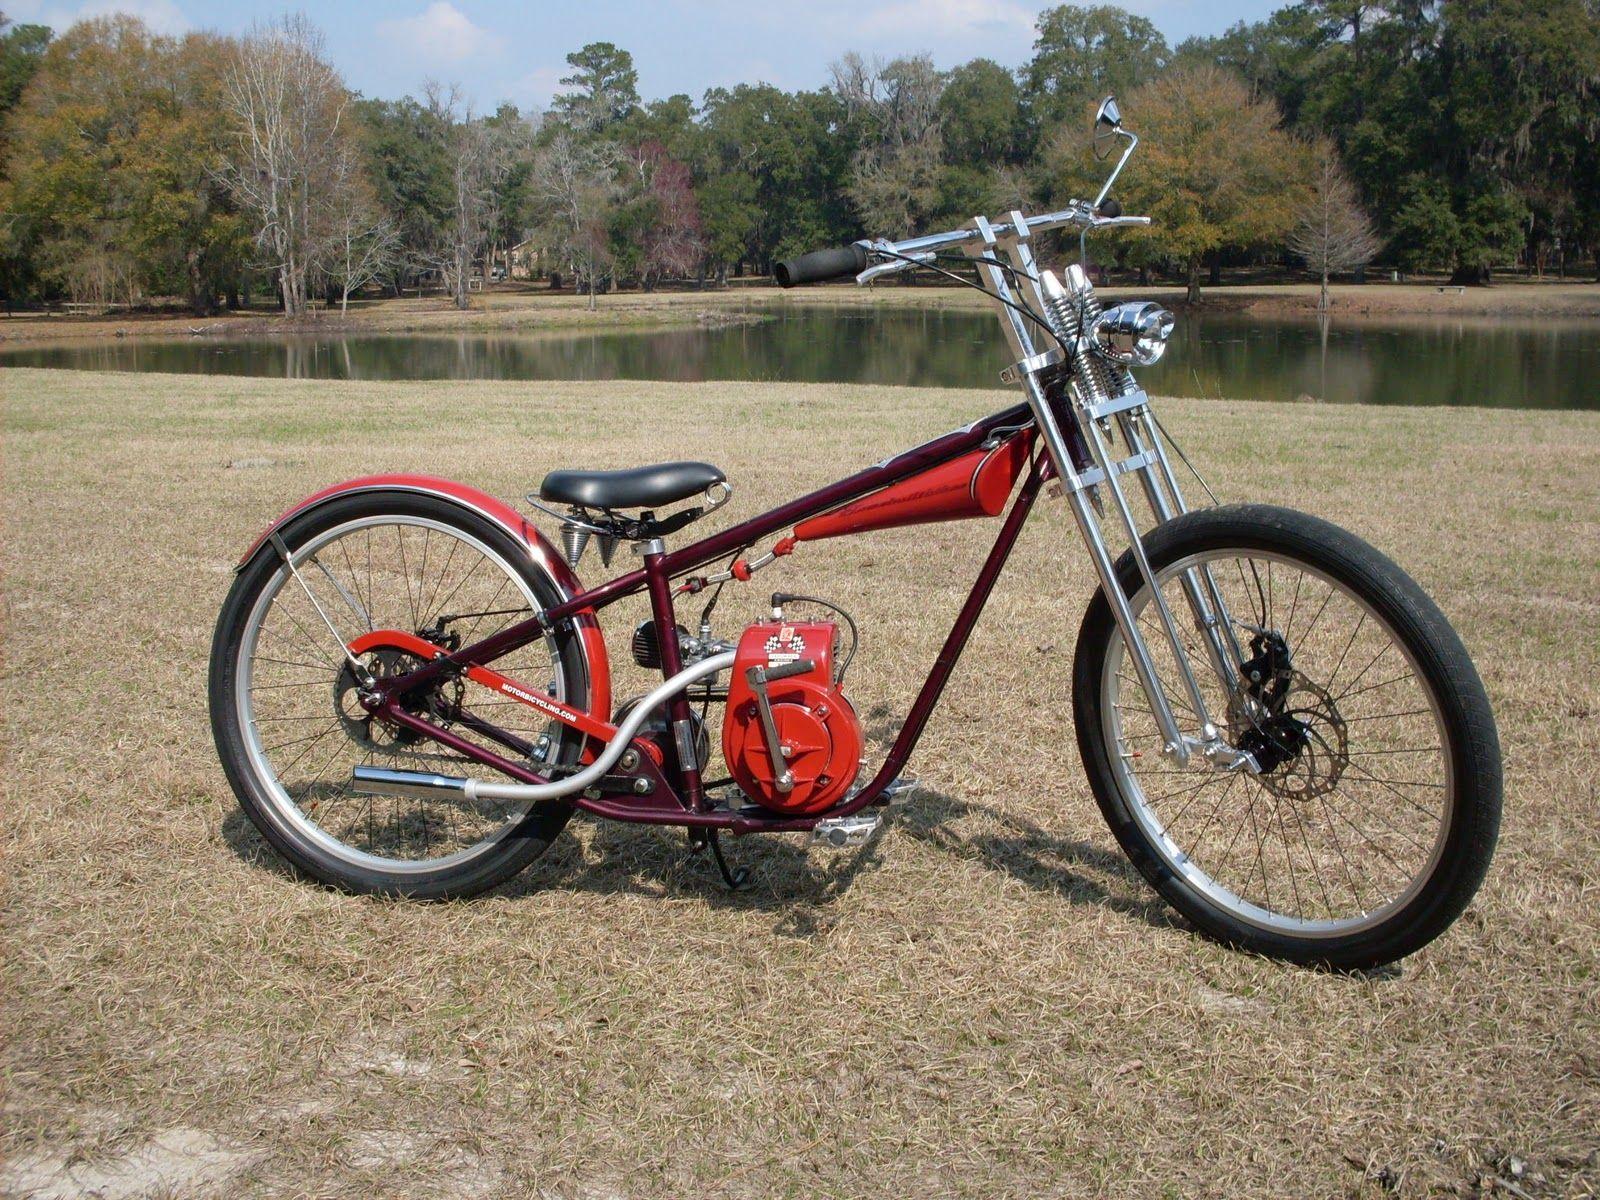 Motorized Bicycle | AtomicZombie Bikes, Recumbents, Trikes